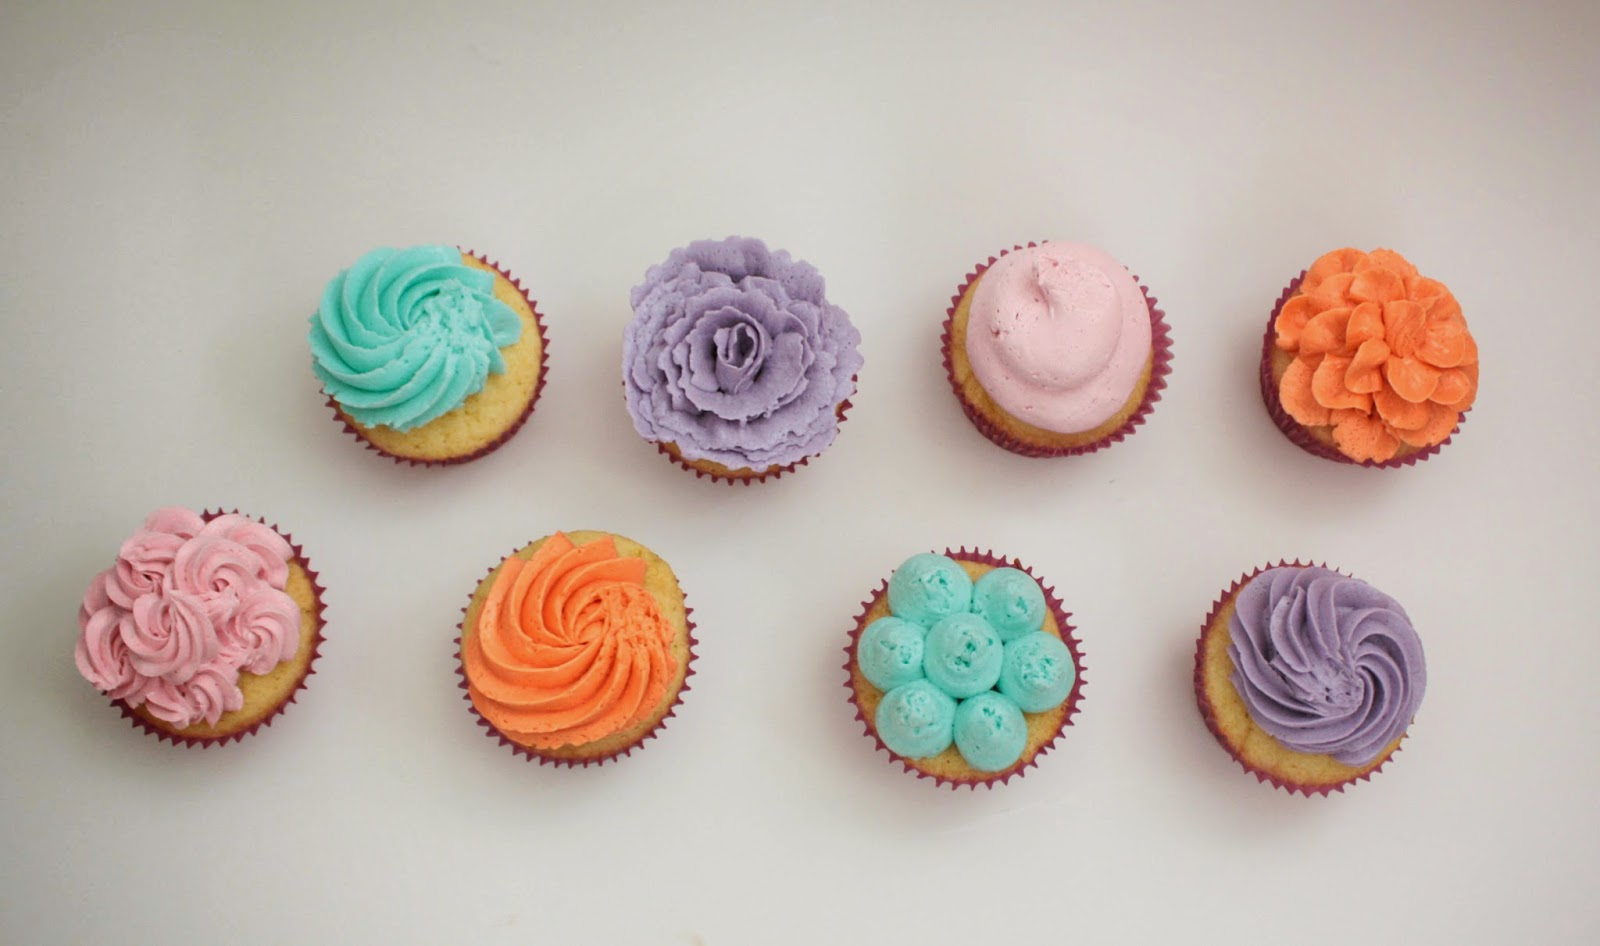 cupcake decorating party - Cupcake Decorating Party